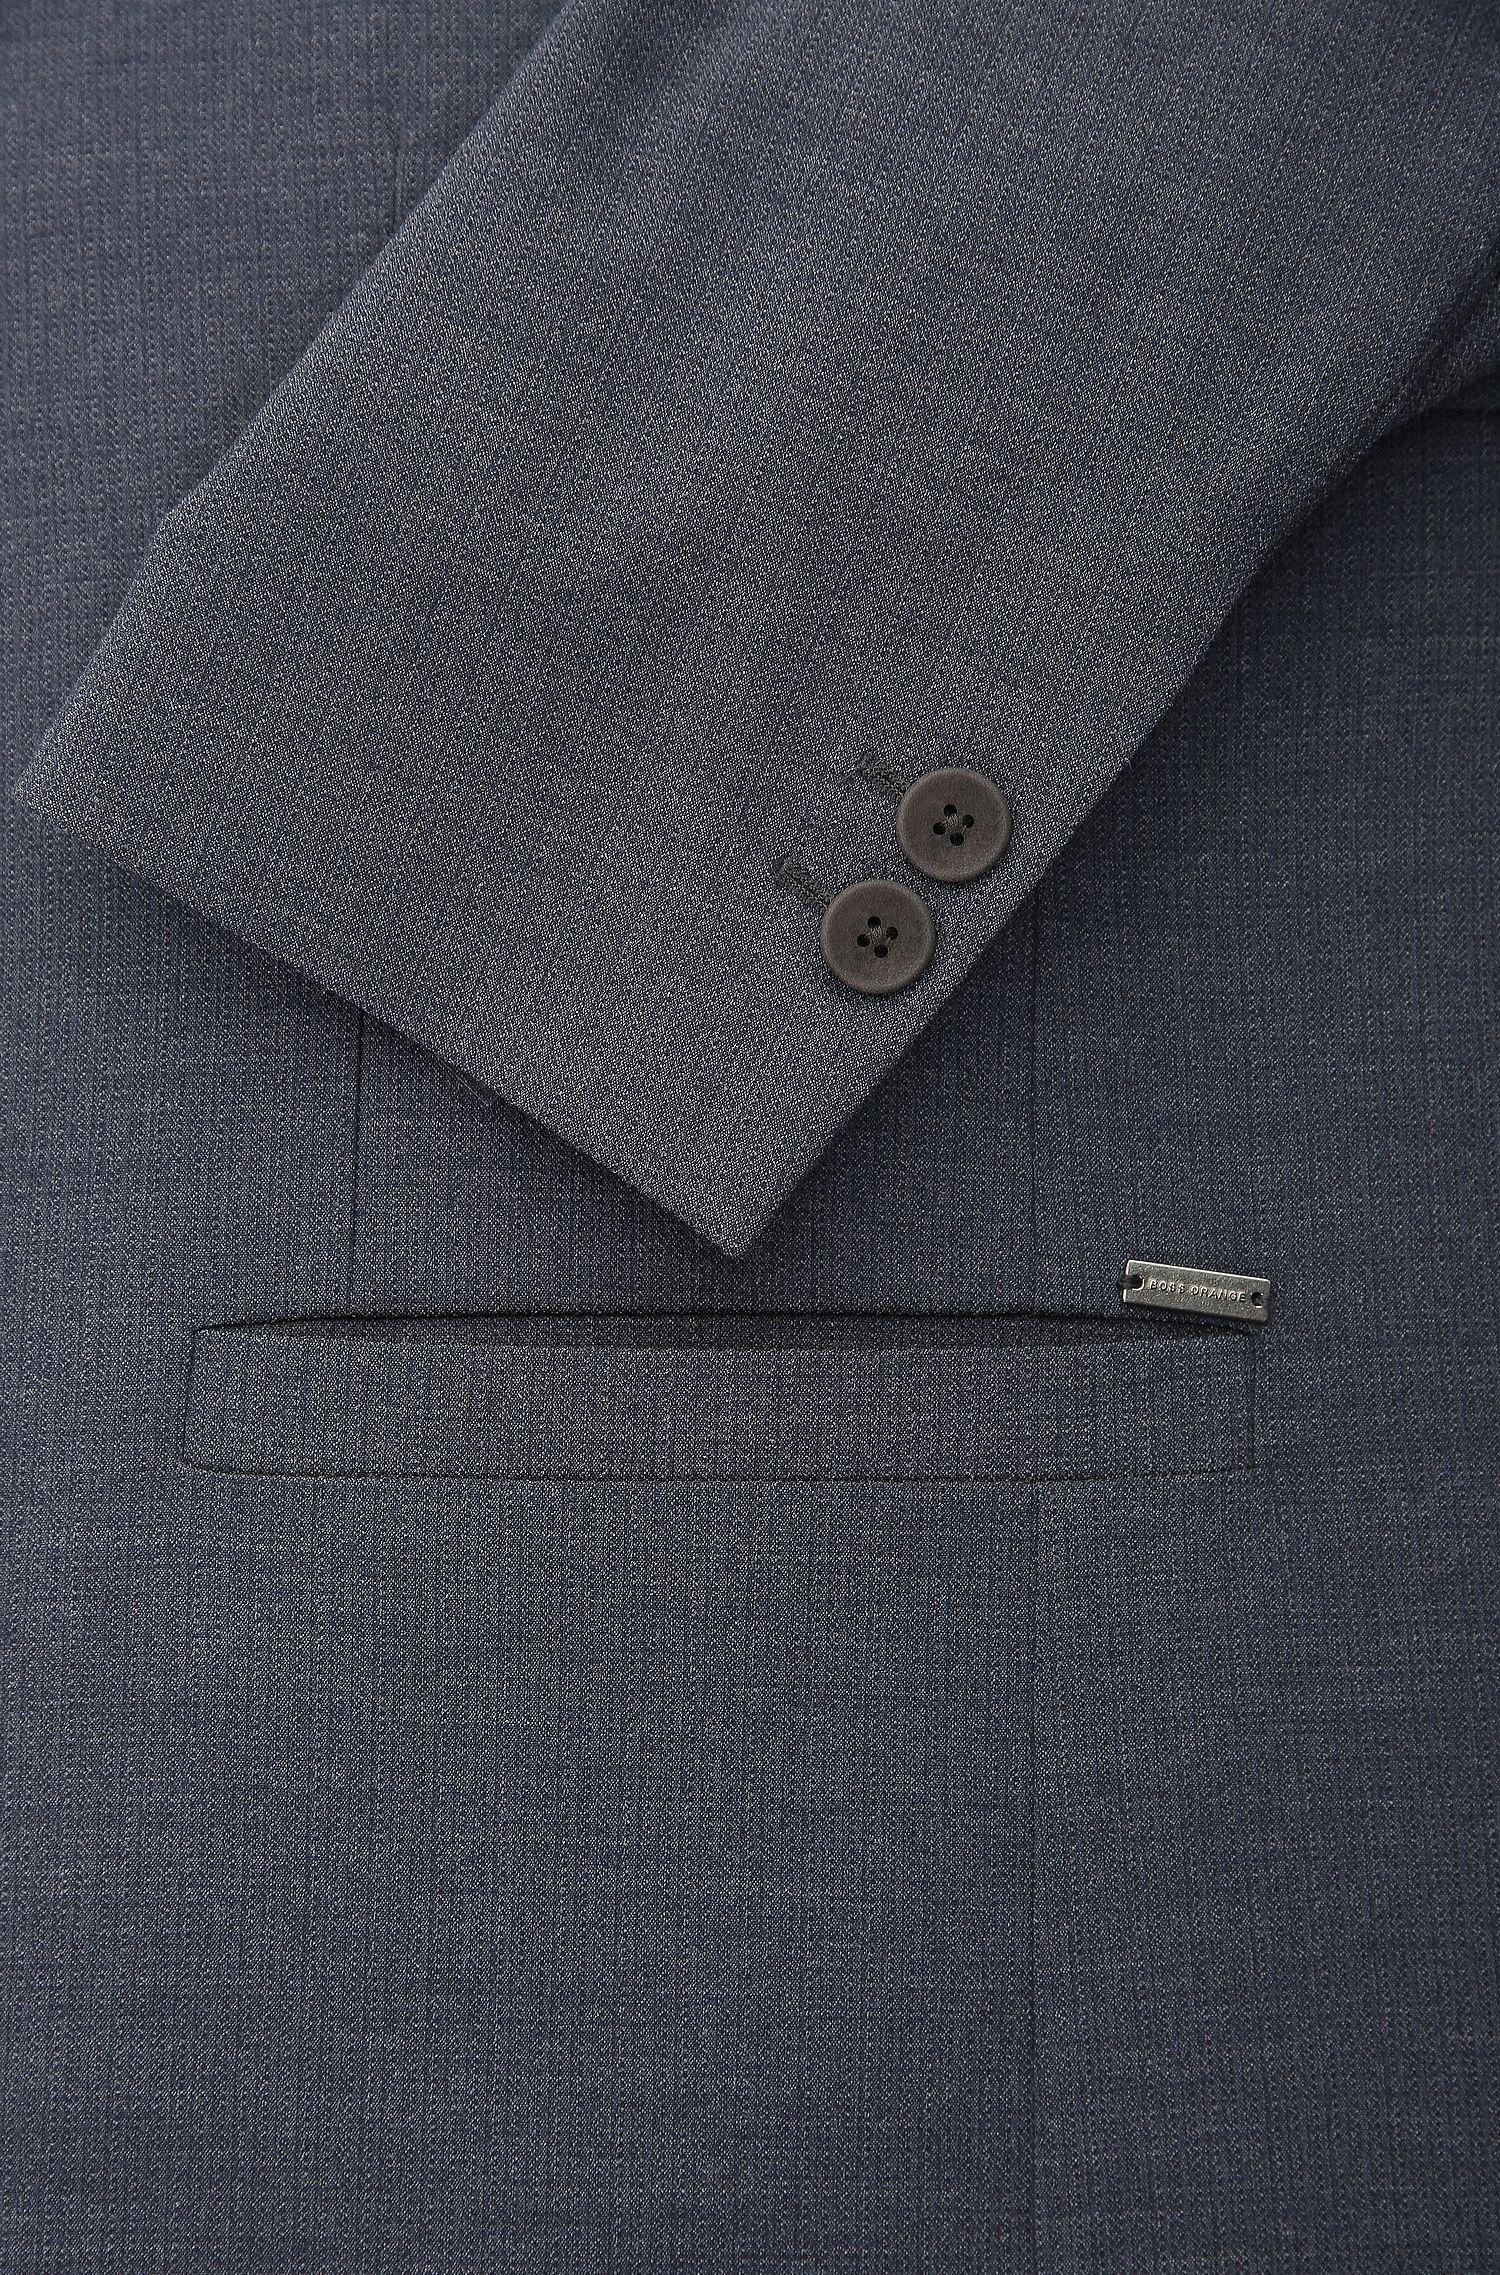 Stretch Blend Sport Coat, Slim Fit | Brandon BS, Dark Blue